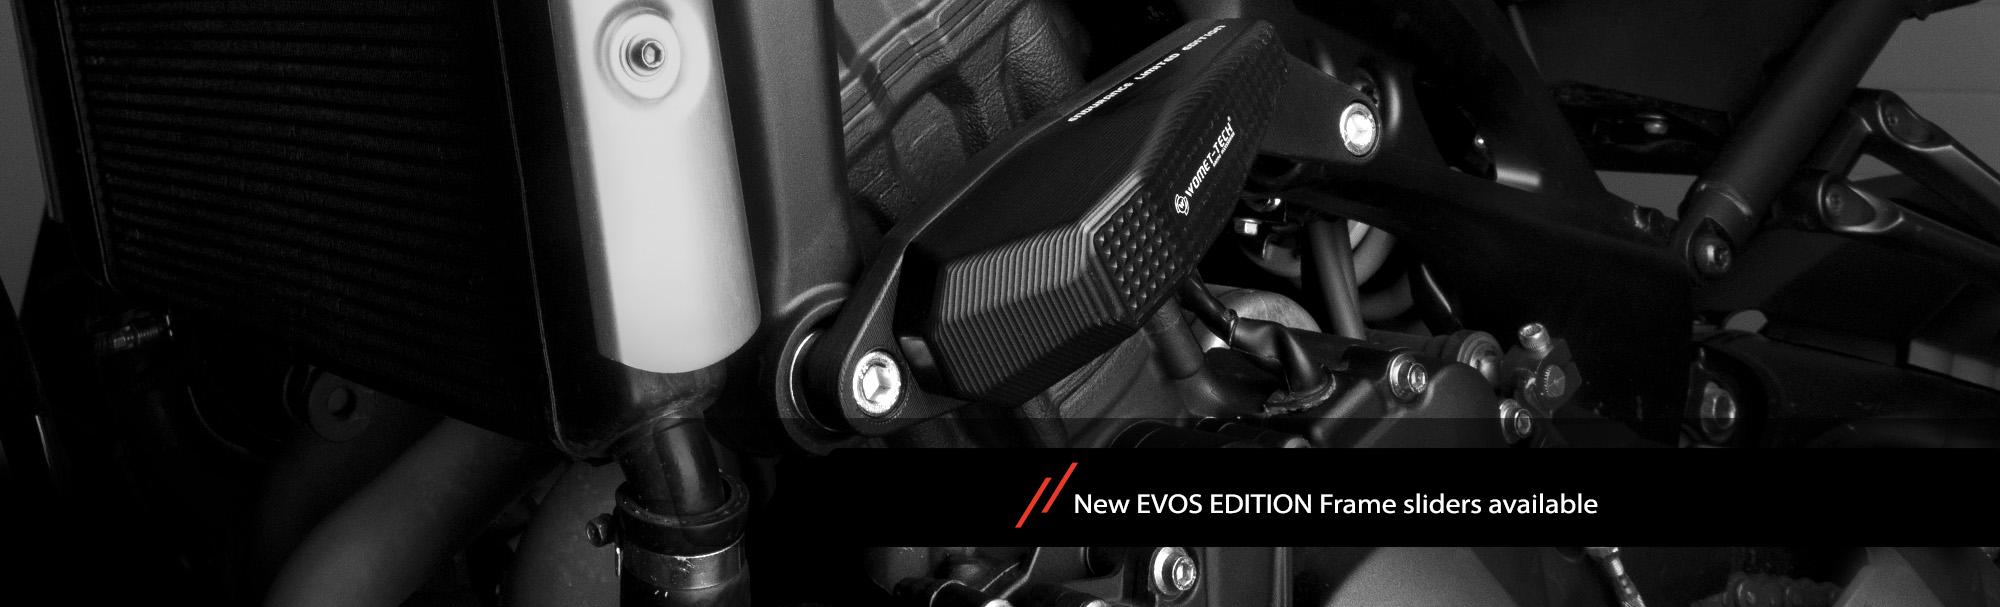 New EVOS EDITION